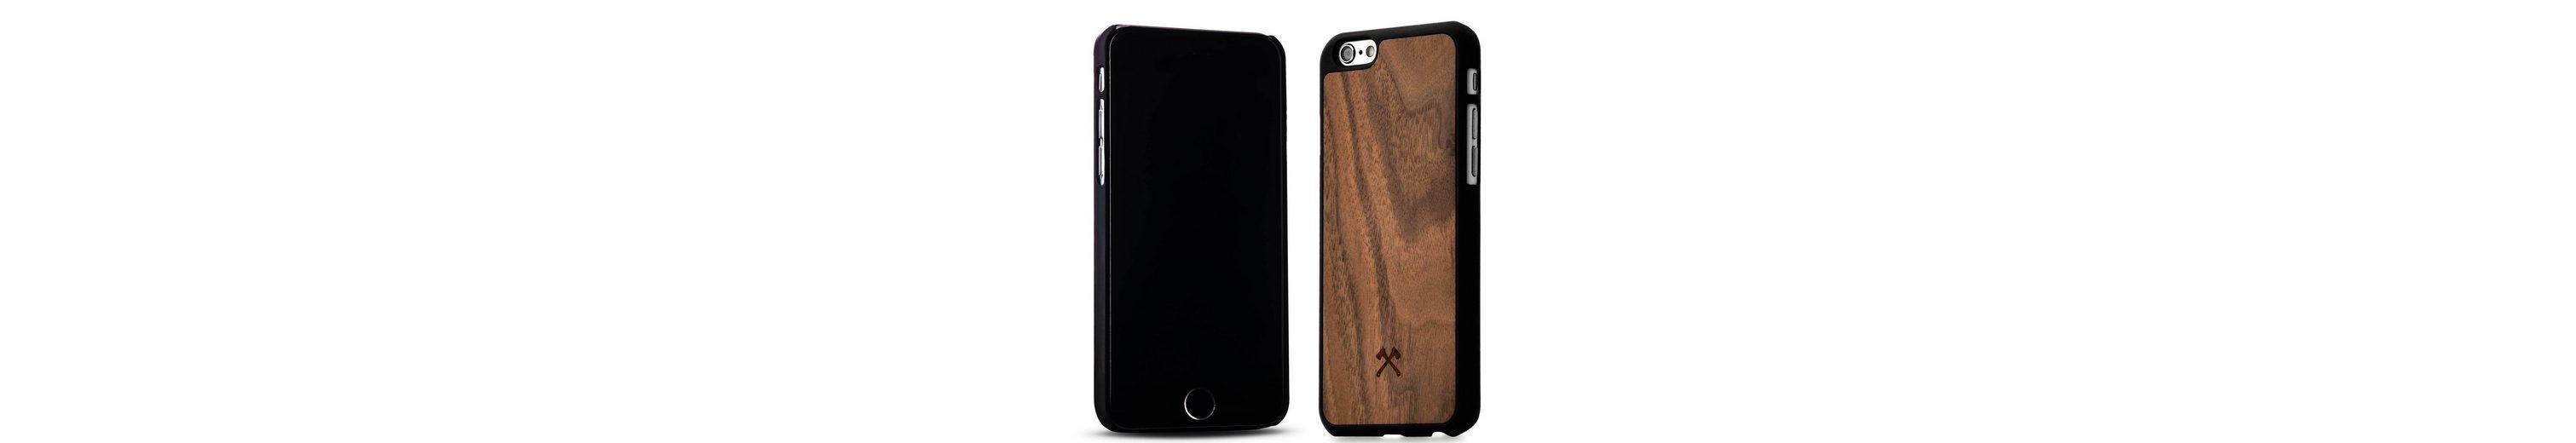 Woodcessories EcoCase - iPhone 6 / 6s Echtholz Case - Calvin